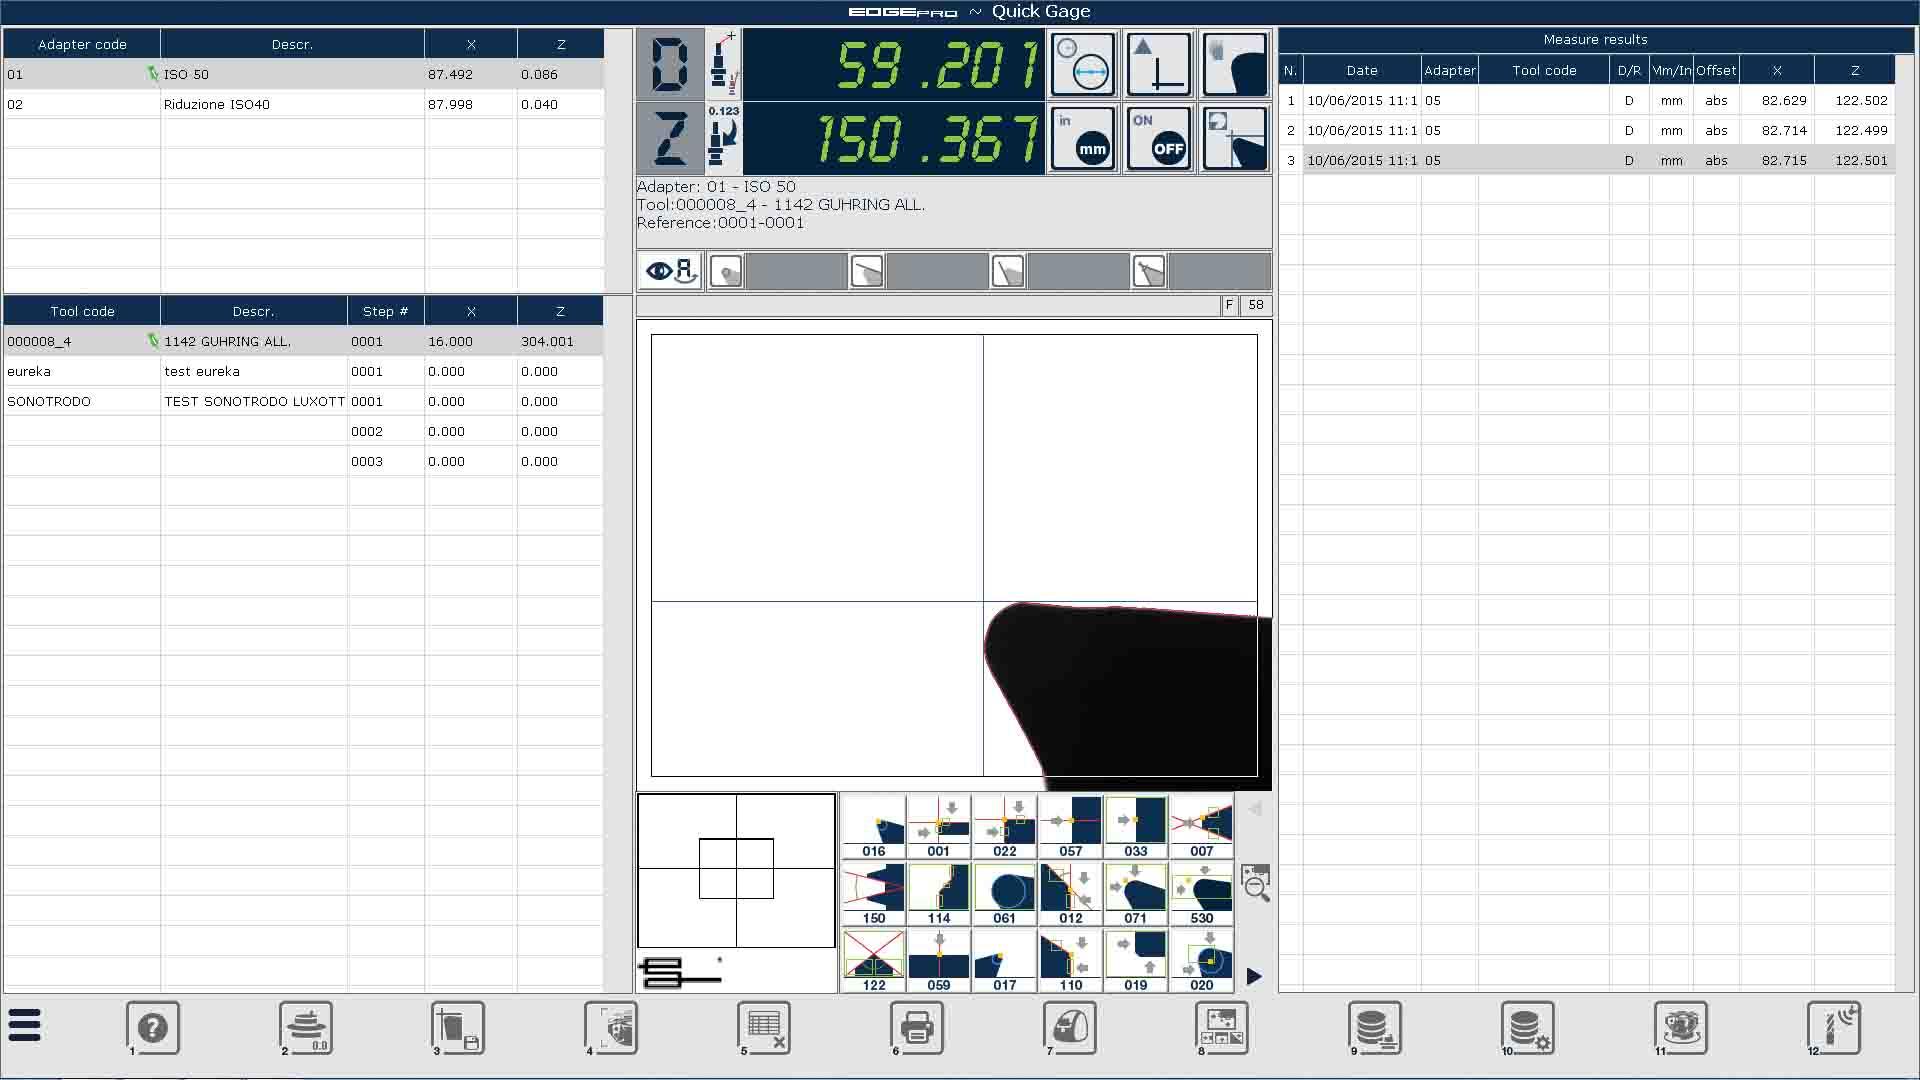 Edge Pro Automatic Edge Detection screen capture.